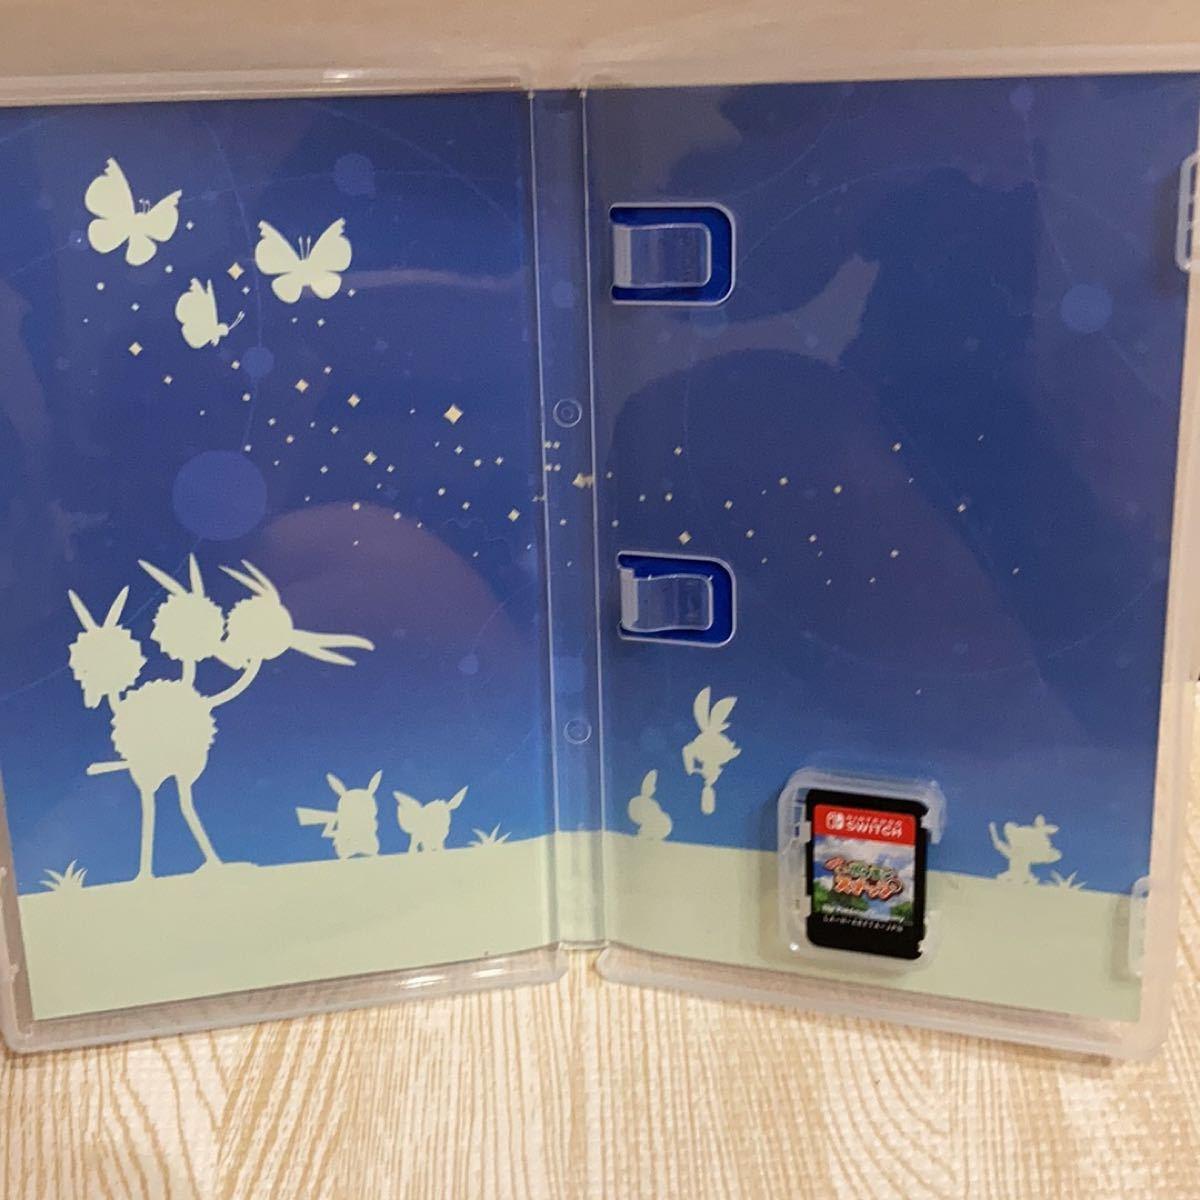 NEWポケモンスナップ Switch 任天堂Switch ニンテンドースイッチSwitchソフト